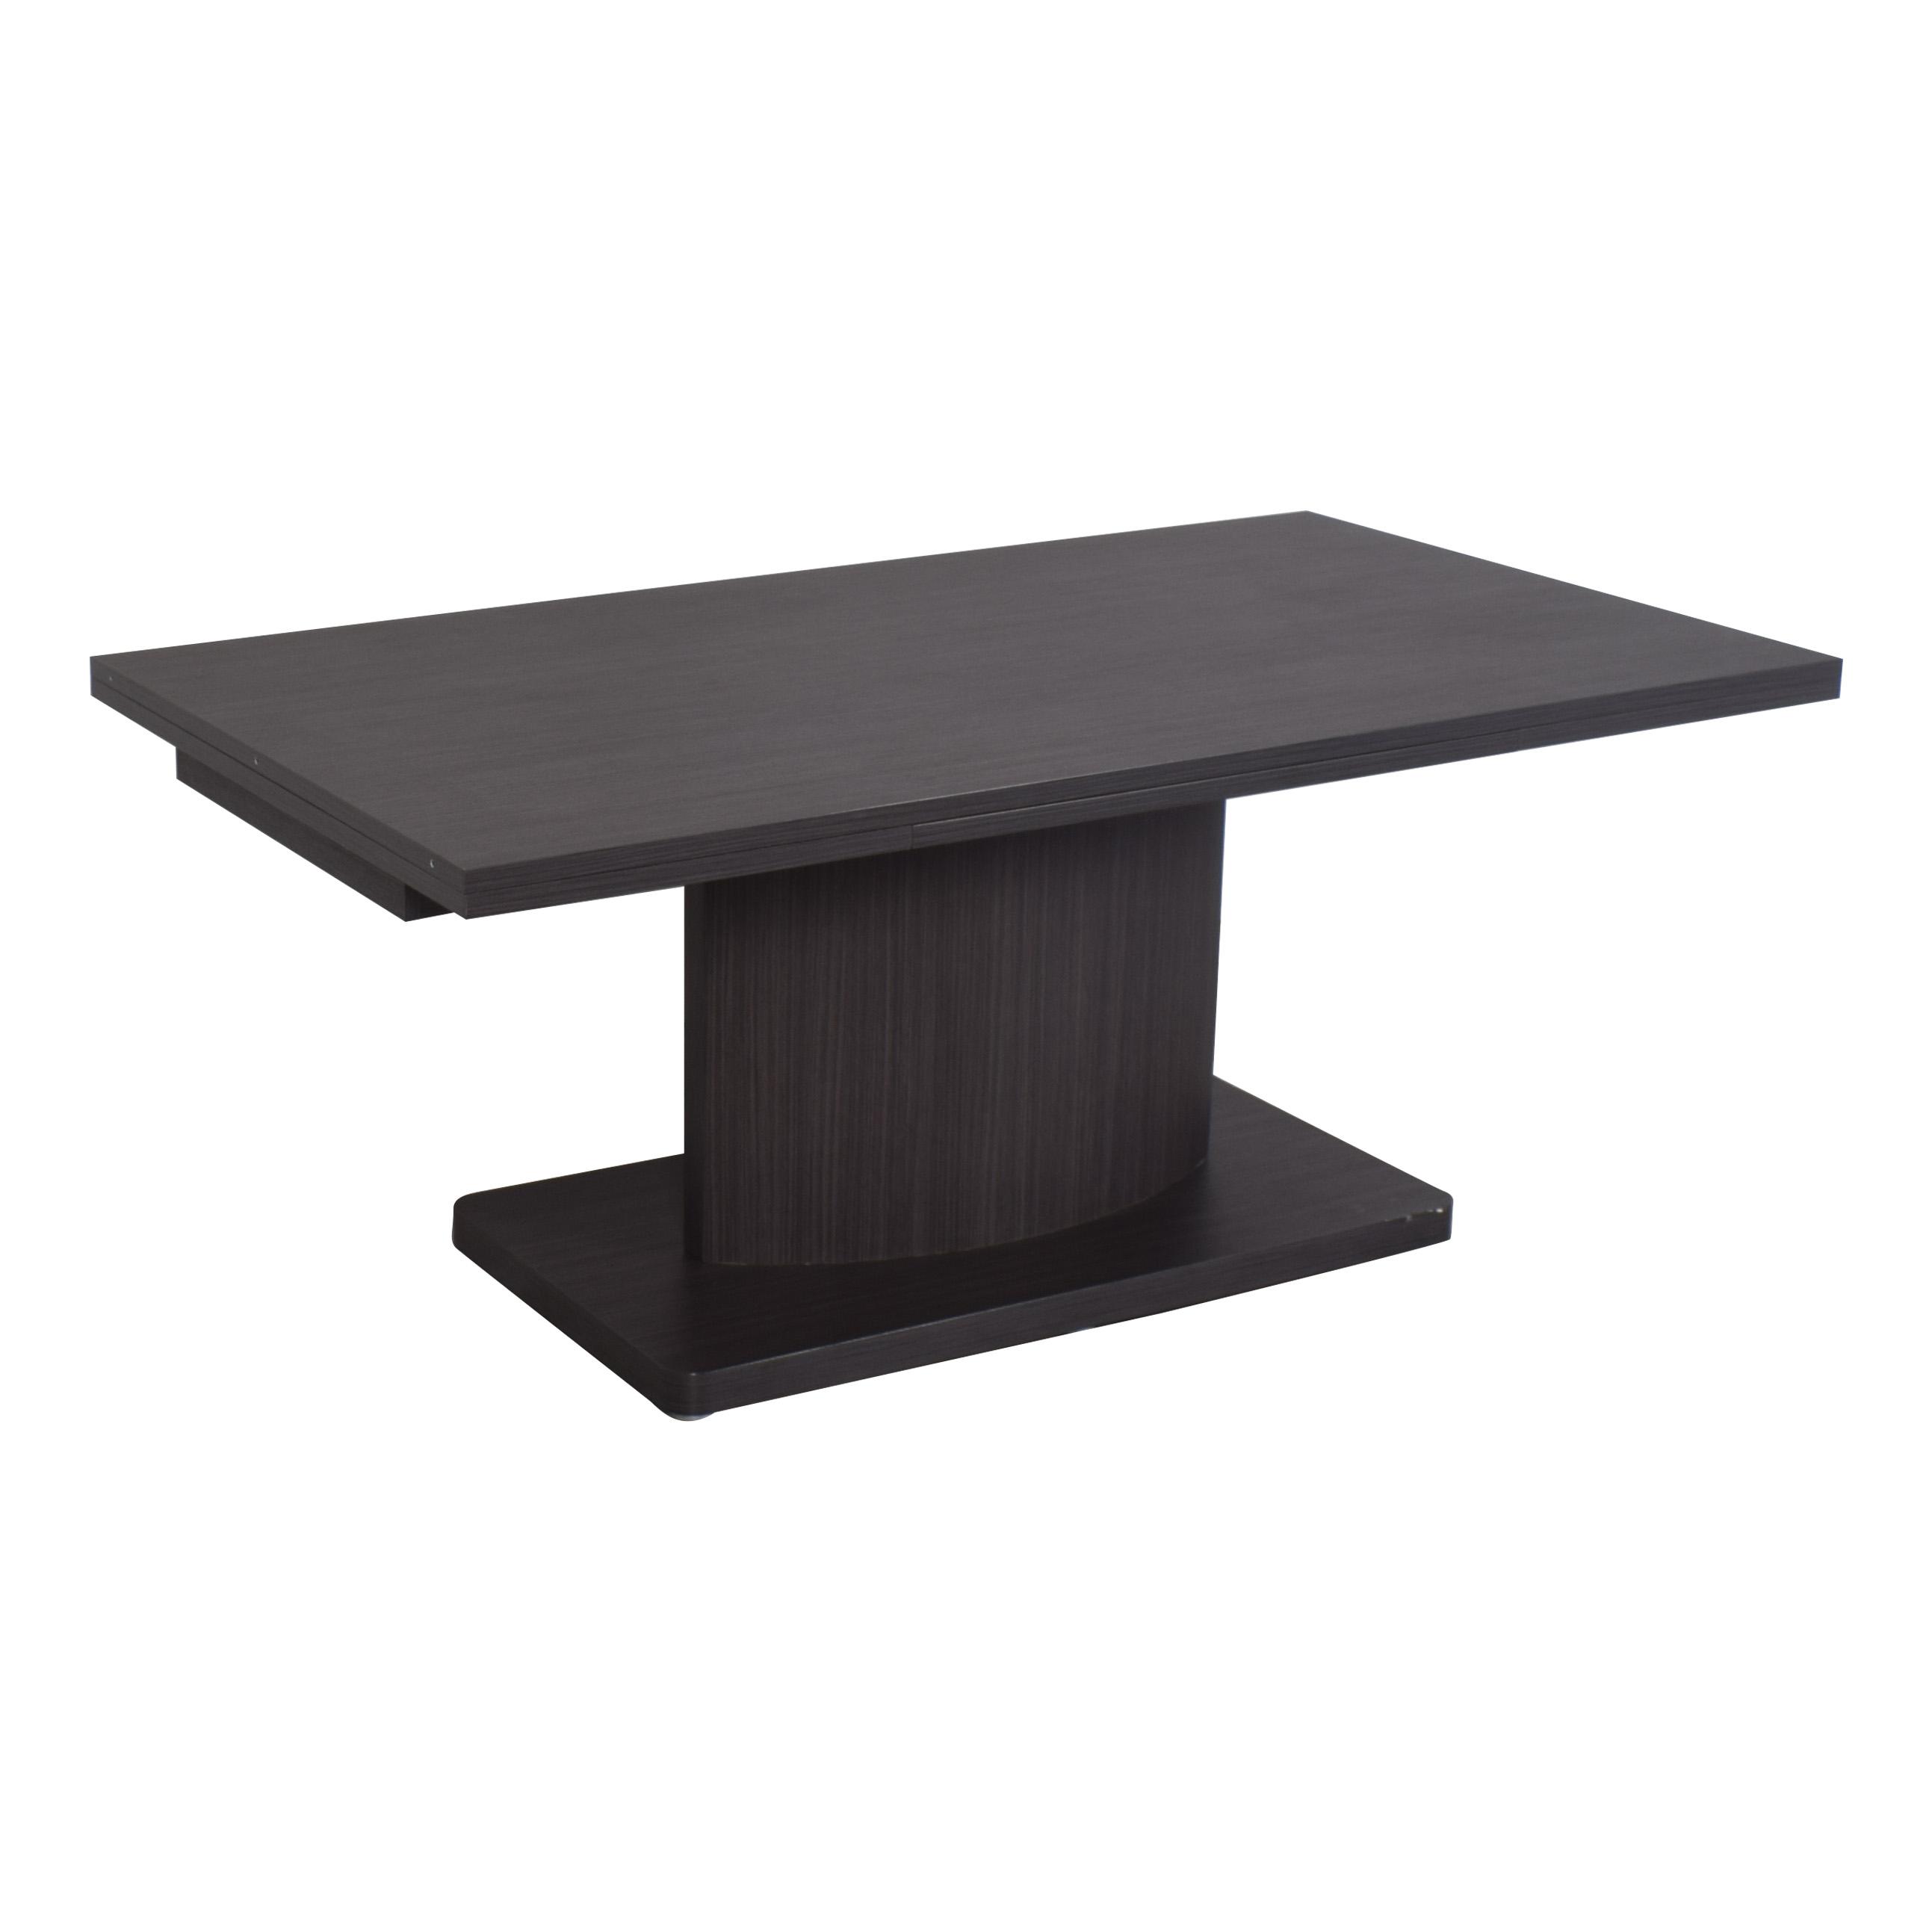 Lazzoni Raena Extendable Dining Table / Tables